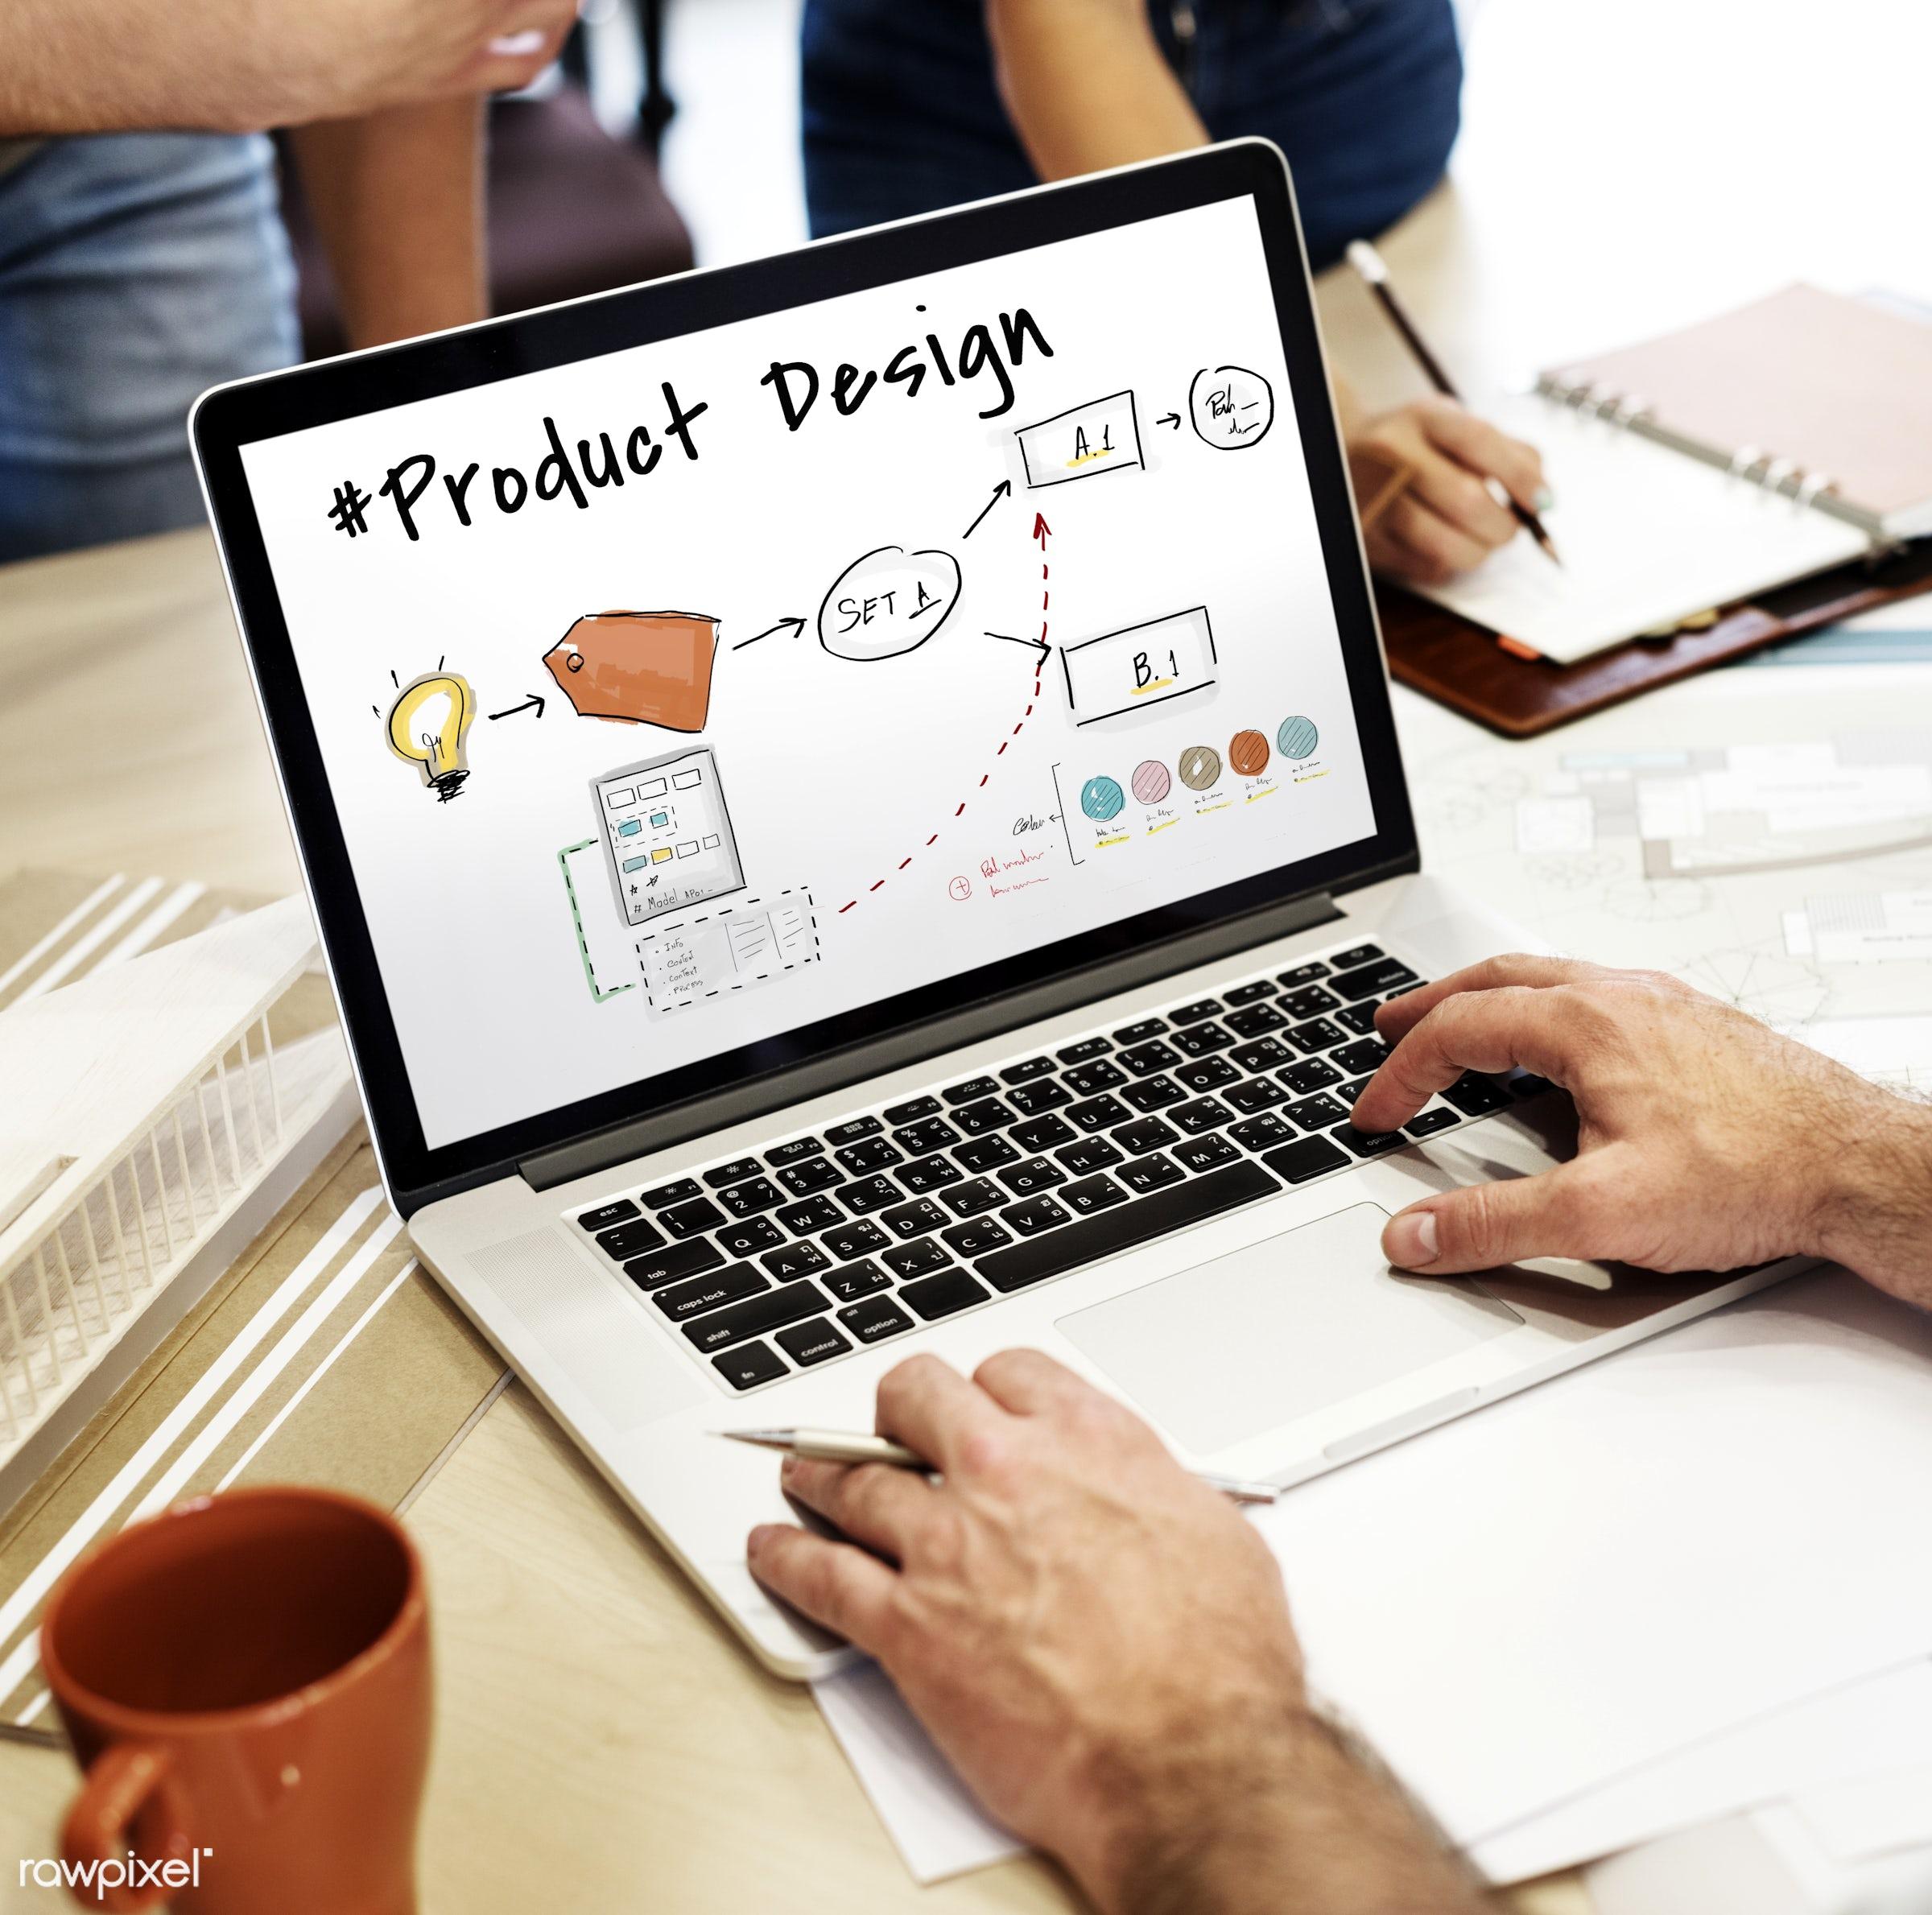 architect, architecture, art, blueprint, brainstorm, brand, business, chart, coffee, coffee cup, concept, conceptualize,...